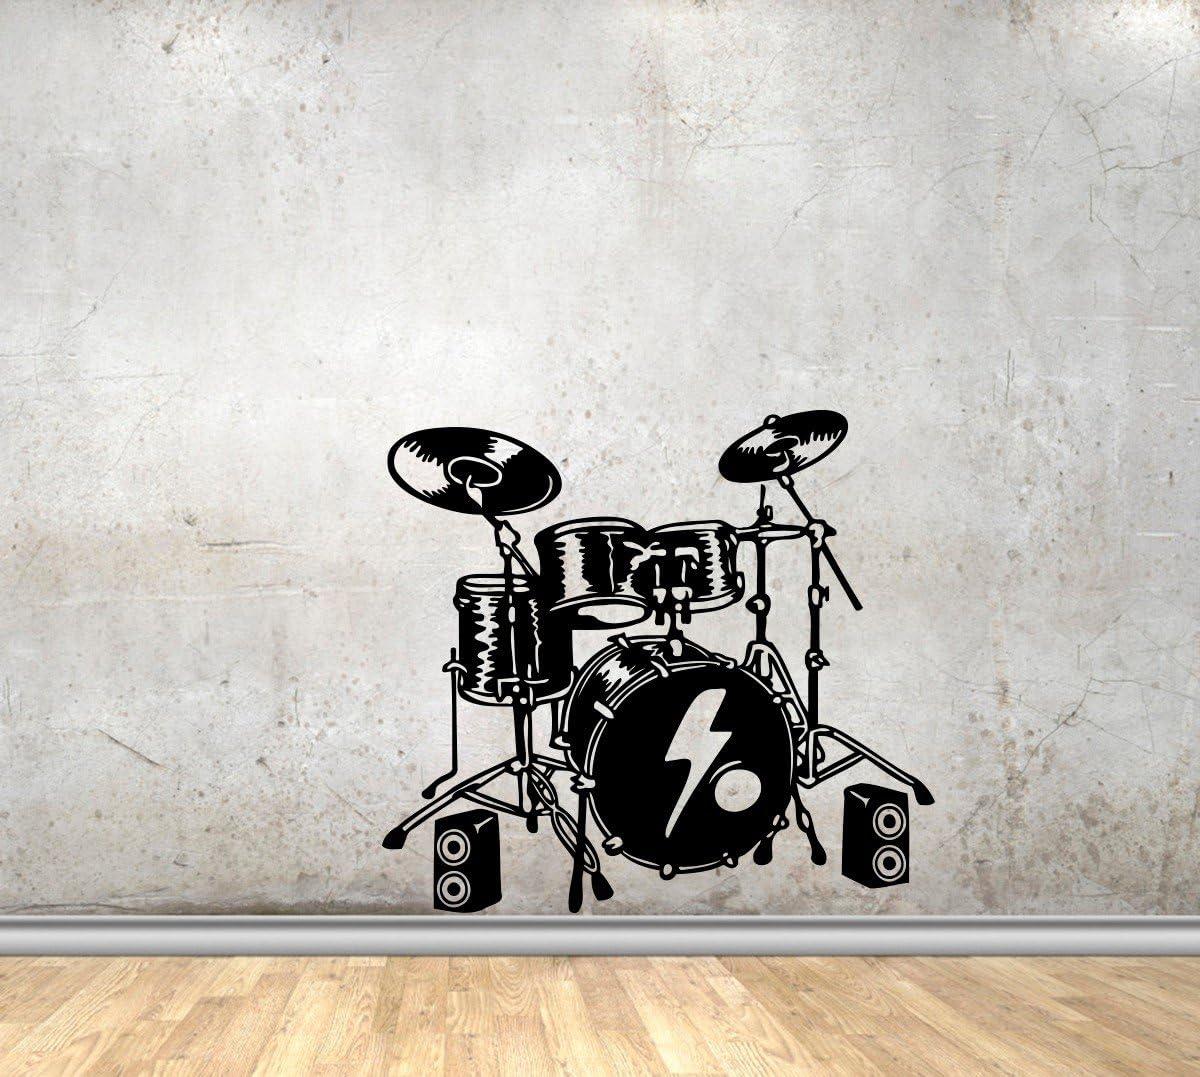 Drum Kit Wall Art Sticker 3 sizes